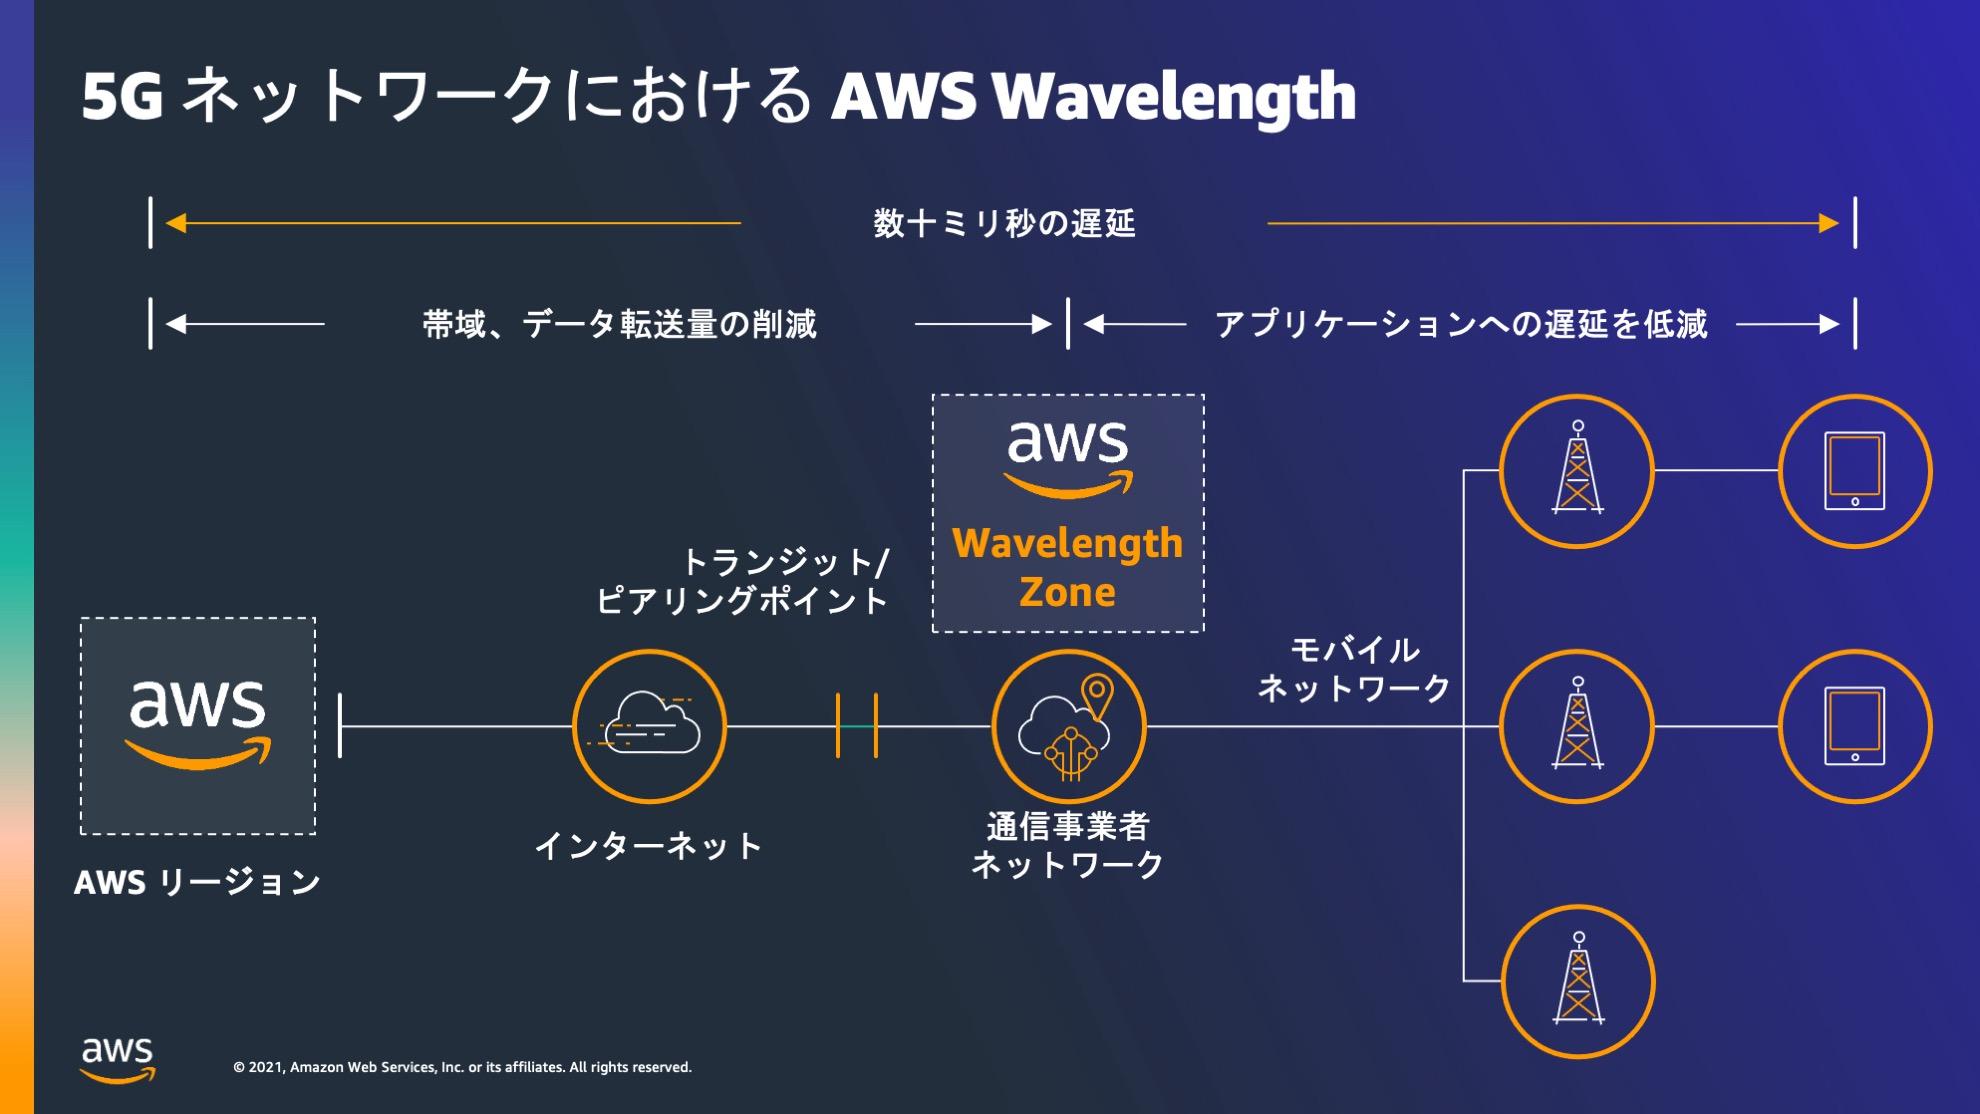 AWS Wavelength